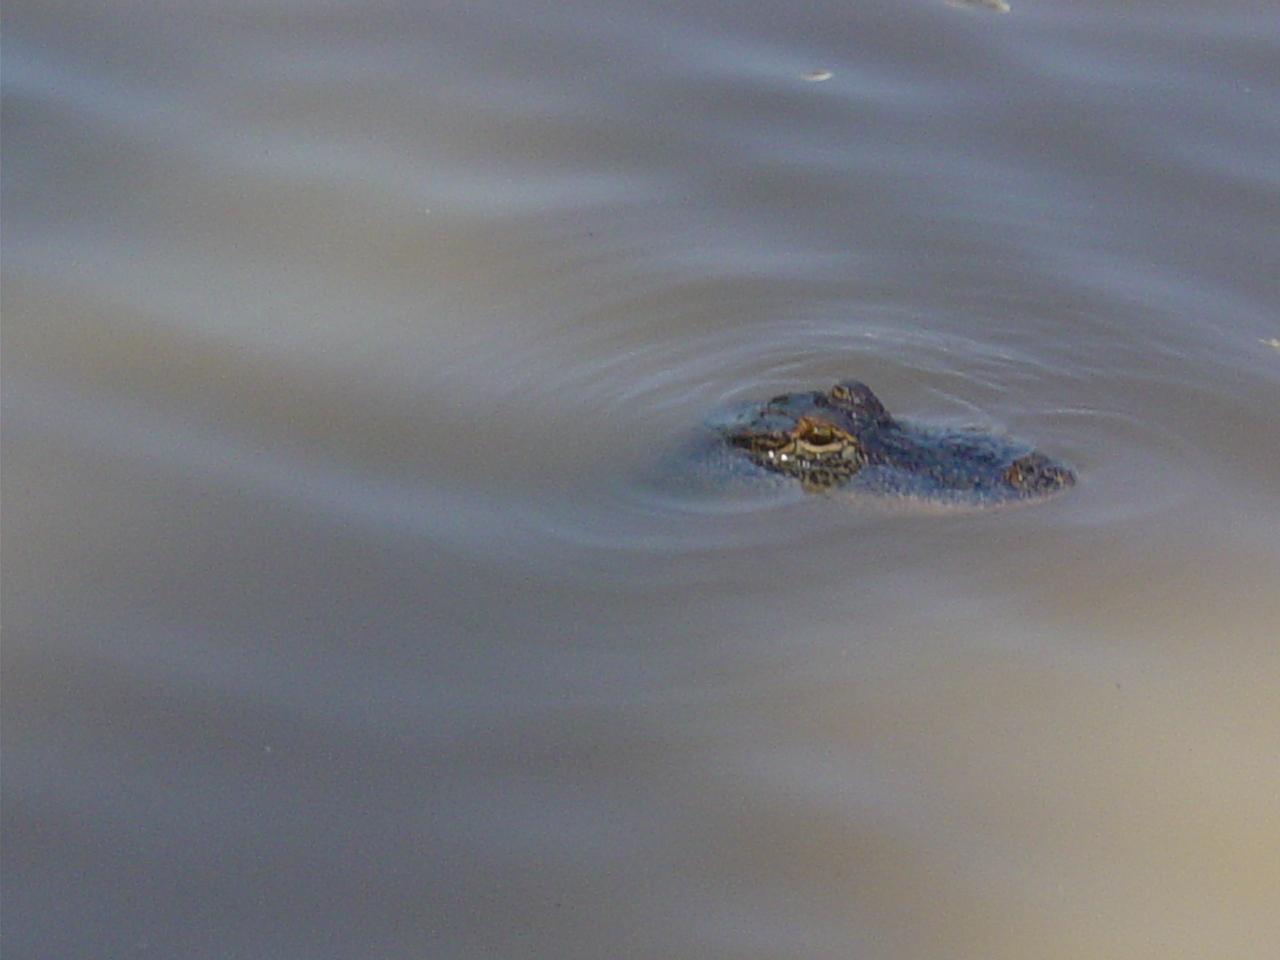 Gator flip